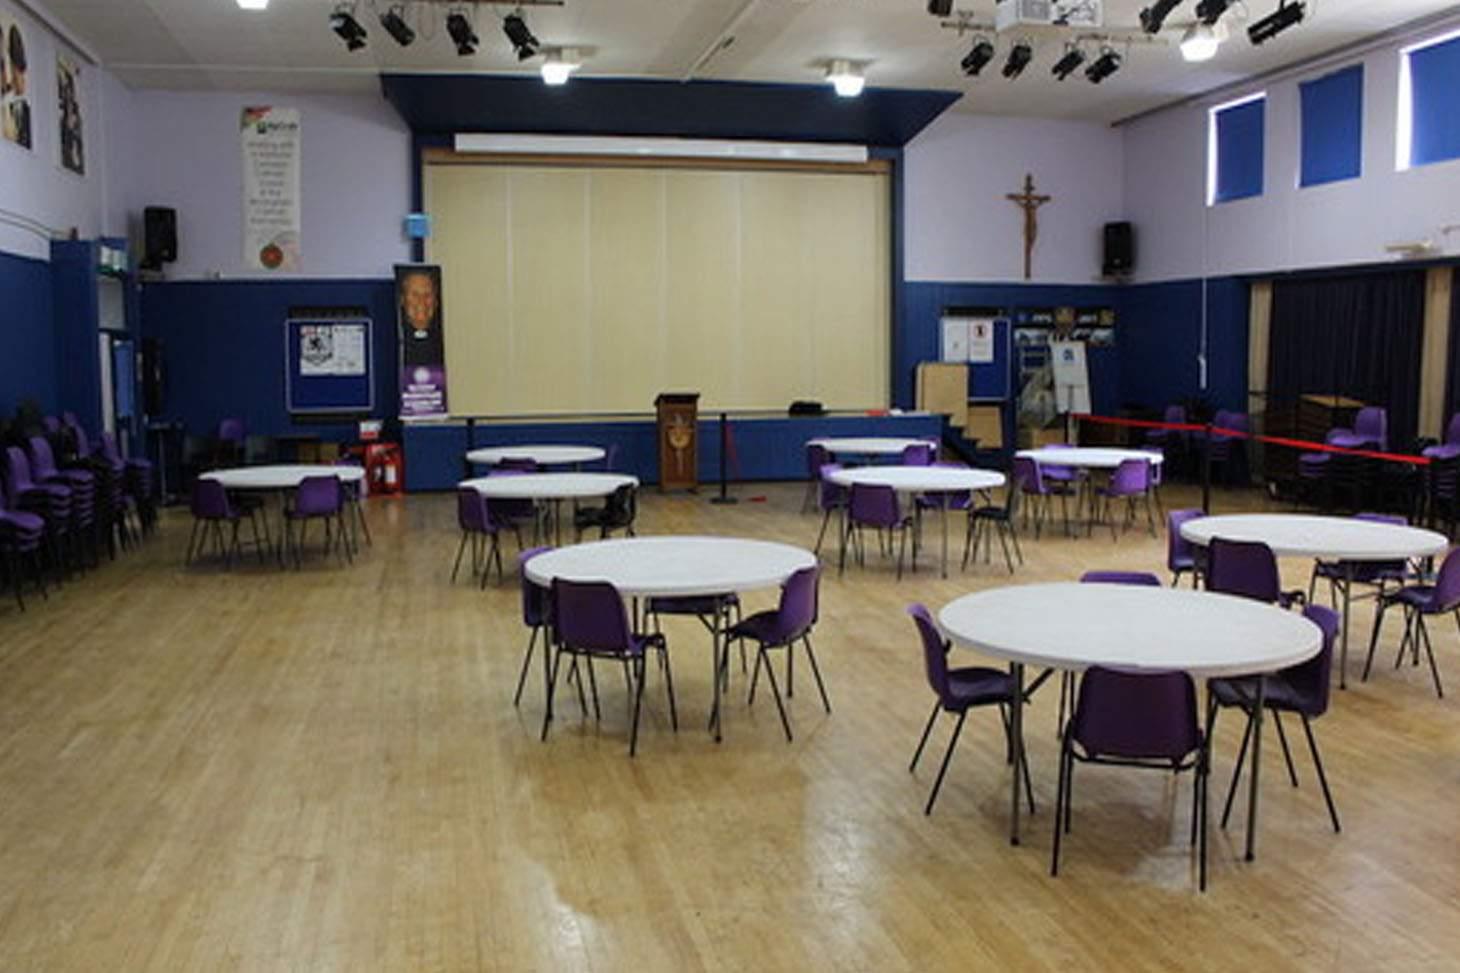 St Edmund Campion Catholic School & Sixth Form Centre Main hall space hire